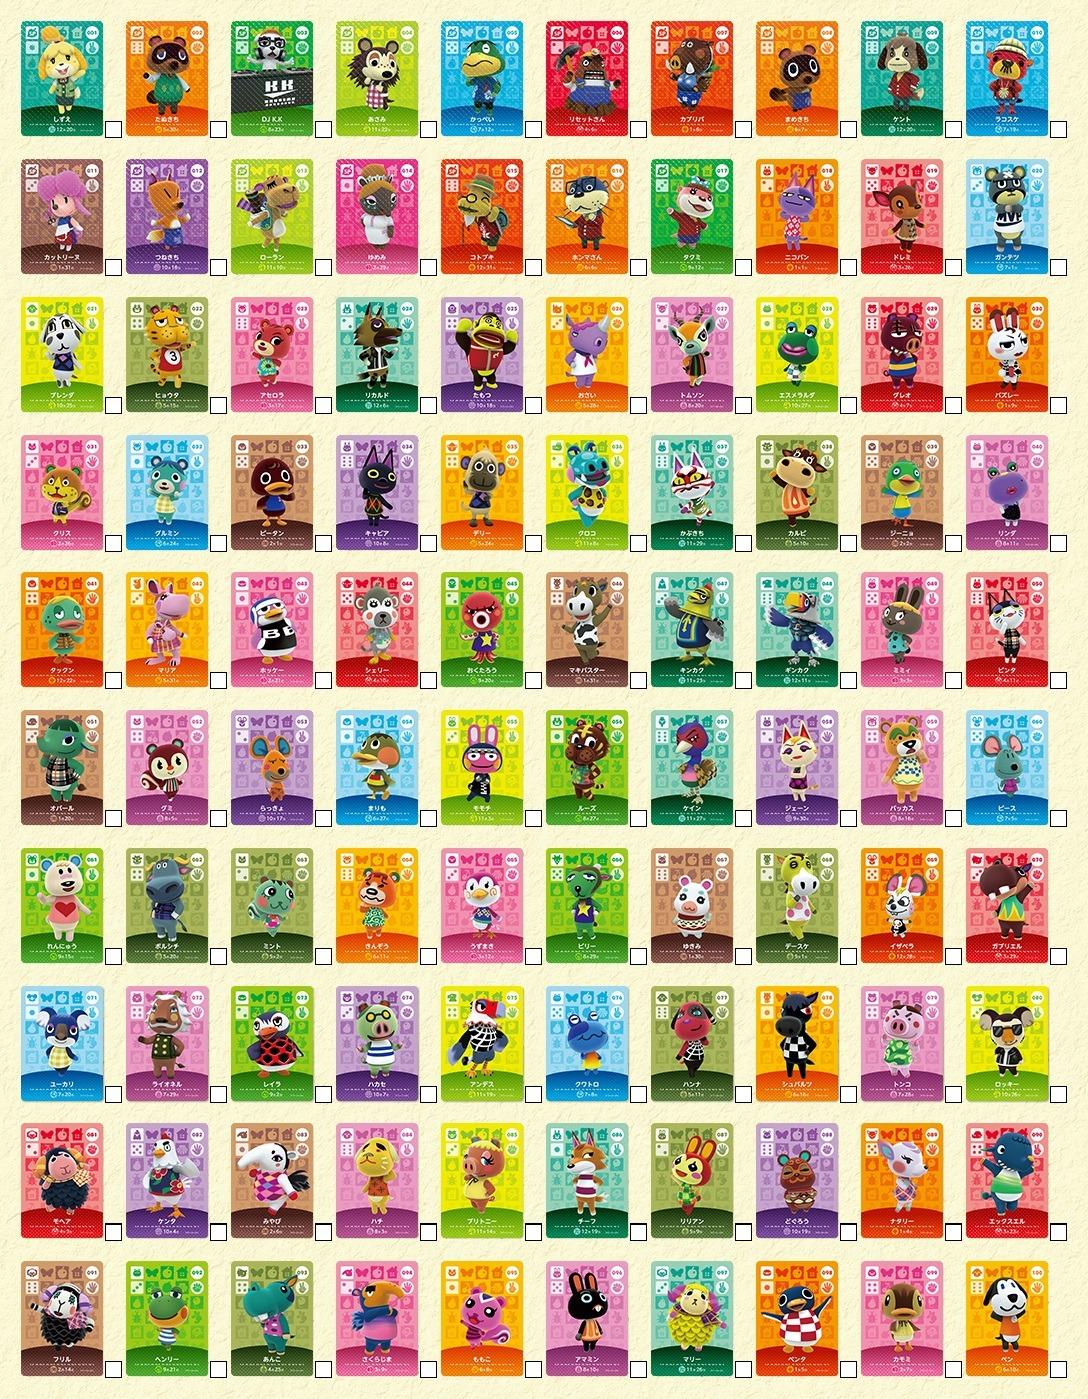 Todas las cartas amiibo (Animal Crossing) - Página 2 Tumblr_nsntcnXQme1s1lku3o1_r1_1280